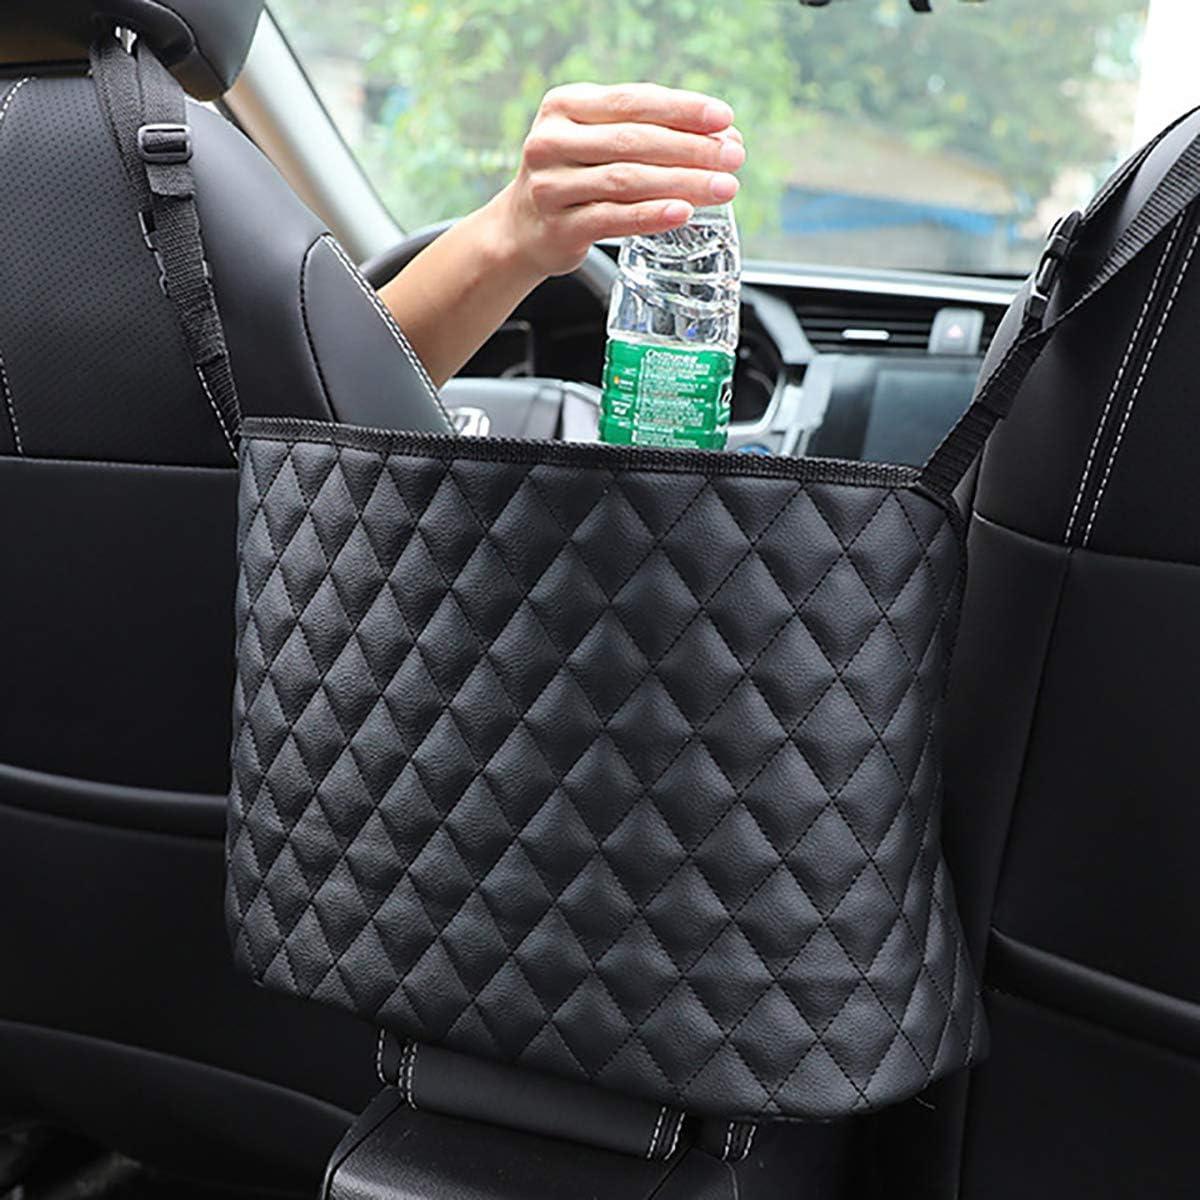 Barrier of Backseat Pet Kids TWAYFEL Car Net Pocket Handbag Holder Black, Upgrade Driver Storage Netting Pouch for Purse Between Two Seat Seat Back Organizer Mesh Large Capacity Bag